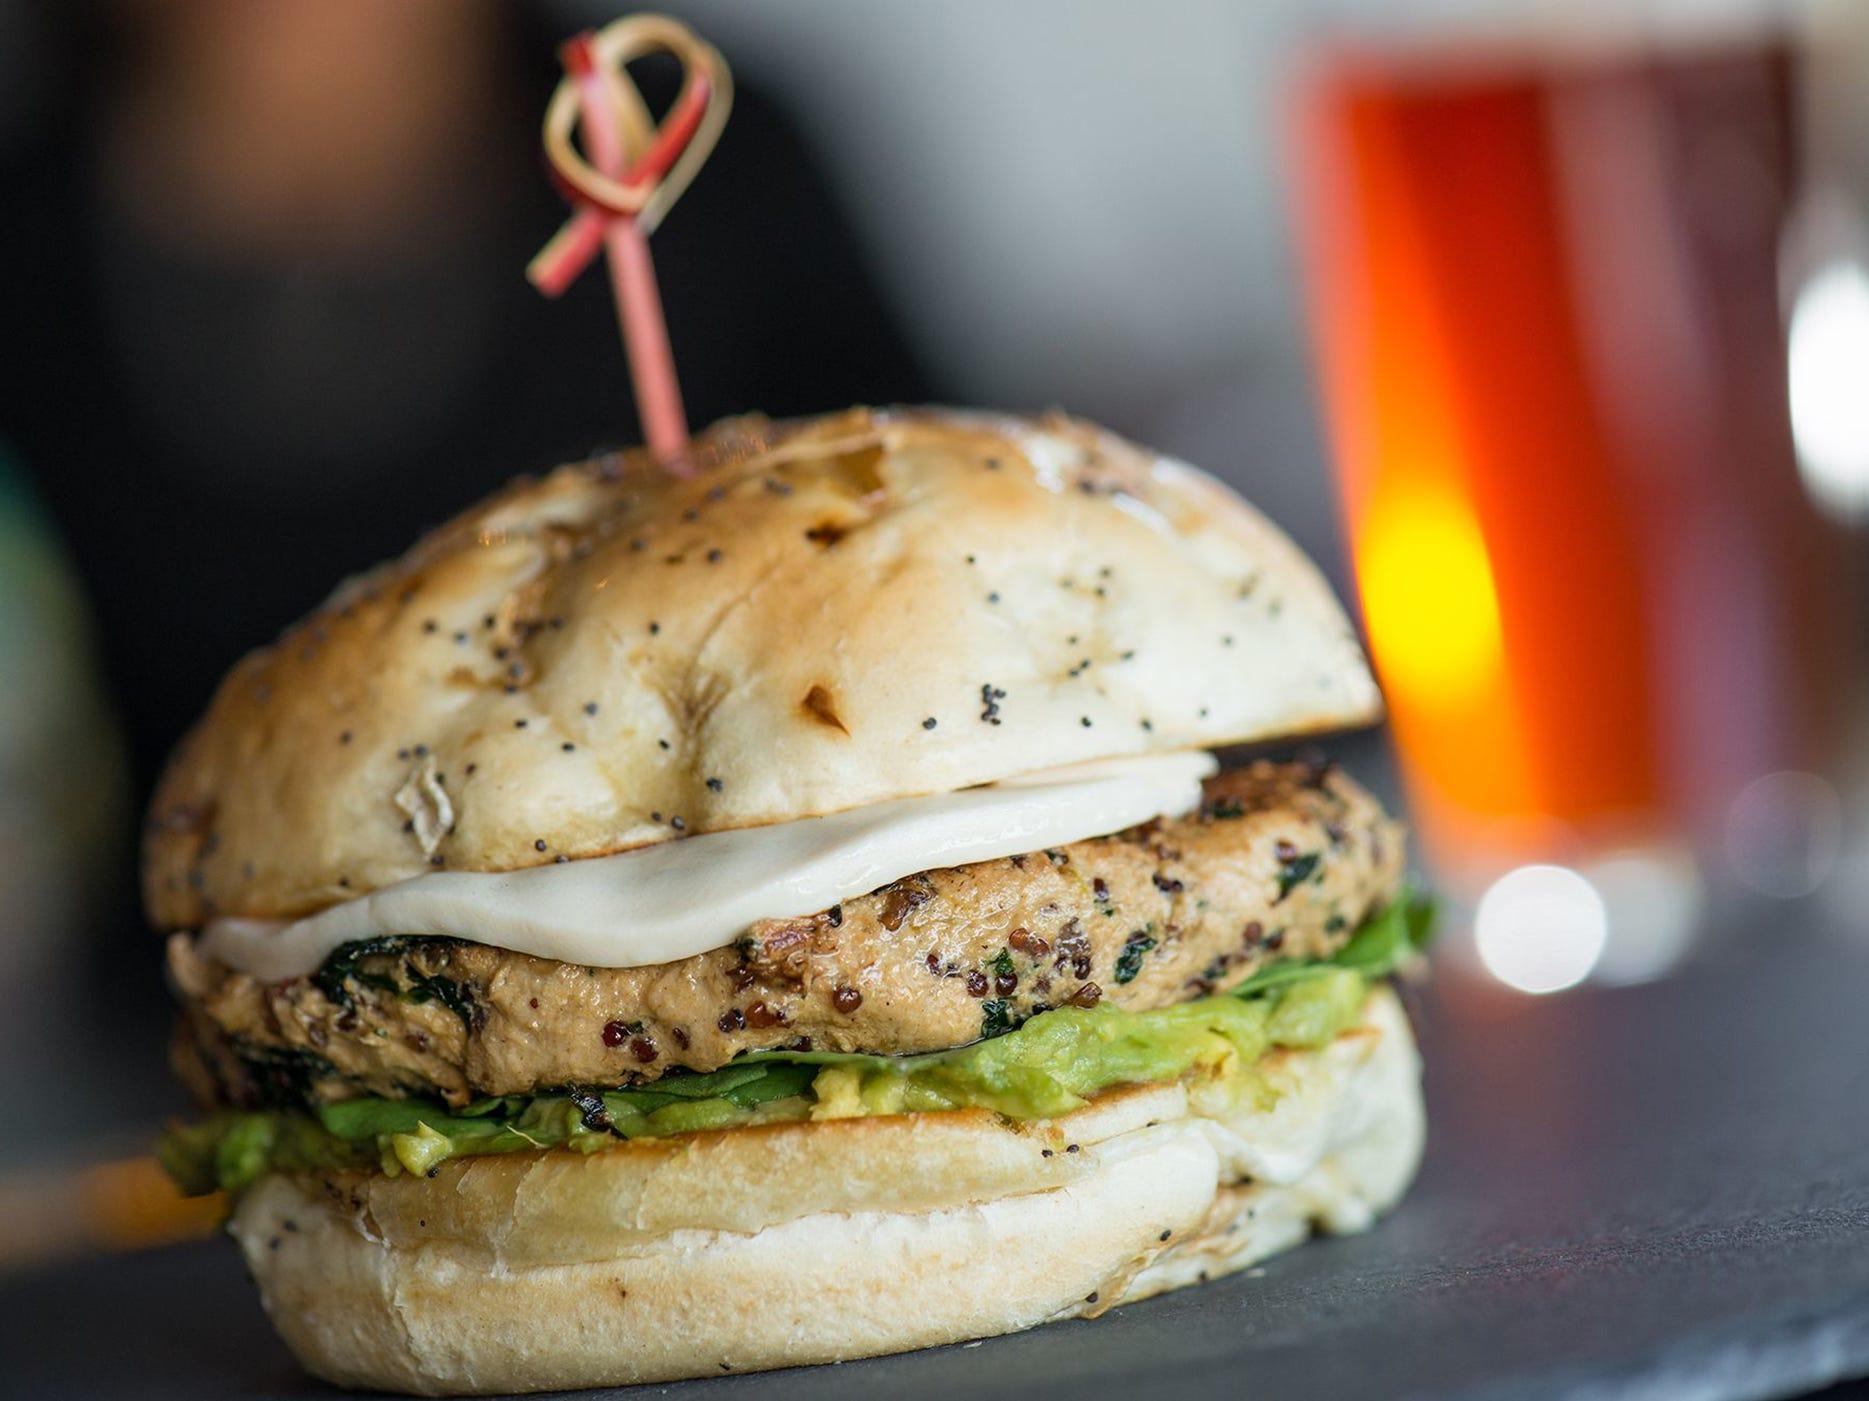 The vegan burger at Yard House is based on a blend of red quinoa, kale and shiitake mushrooms garnished with Daiya vegan mozzarella, avocado, tomato, arugula, onion and miso on an onion bun.